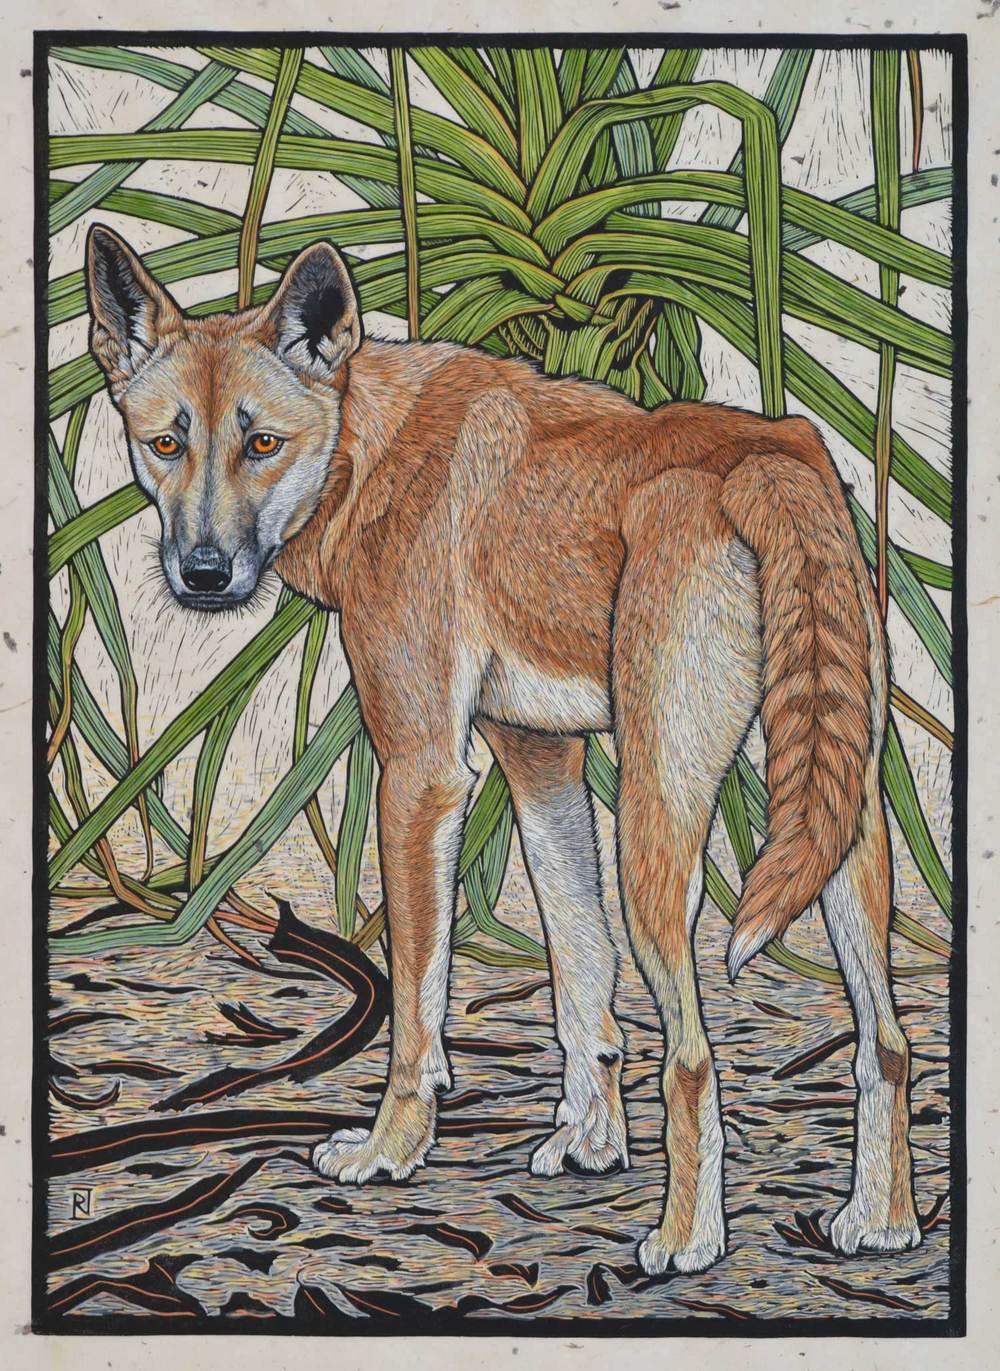 dingo-northern-territory-linocut-rachel-newling.jpg